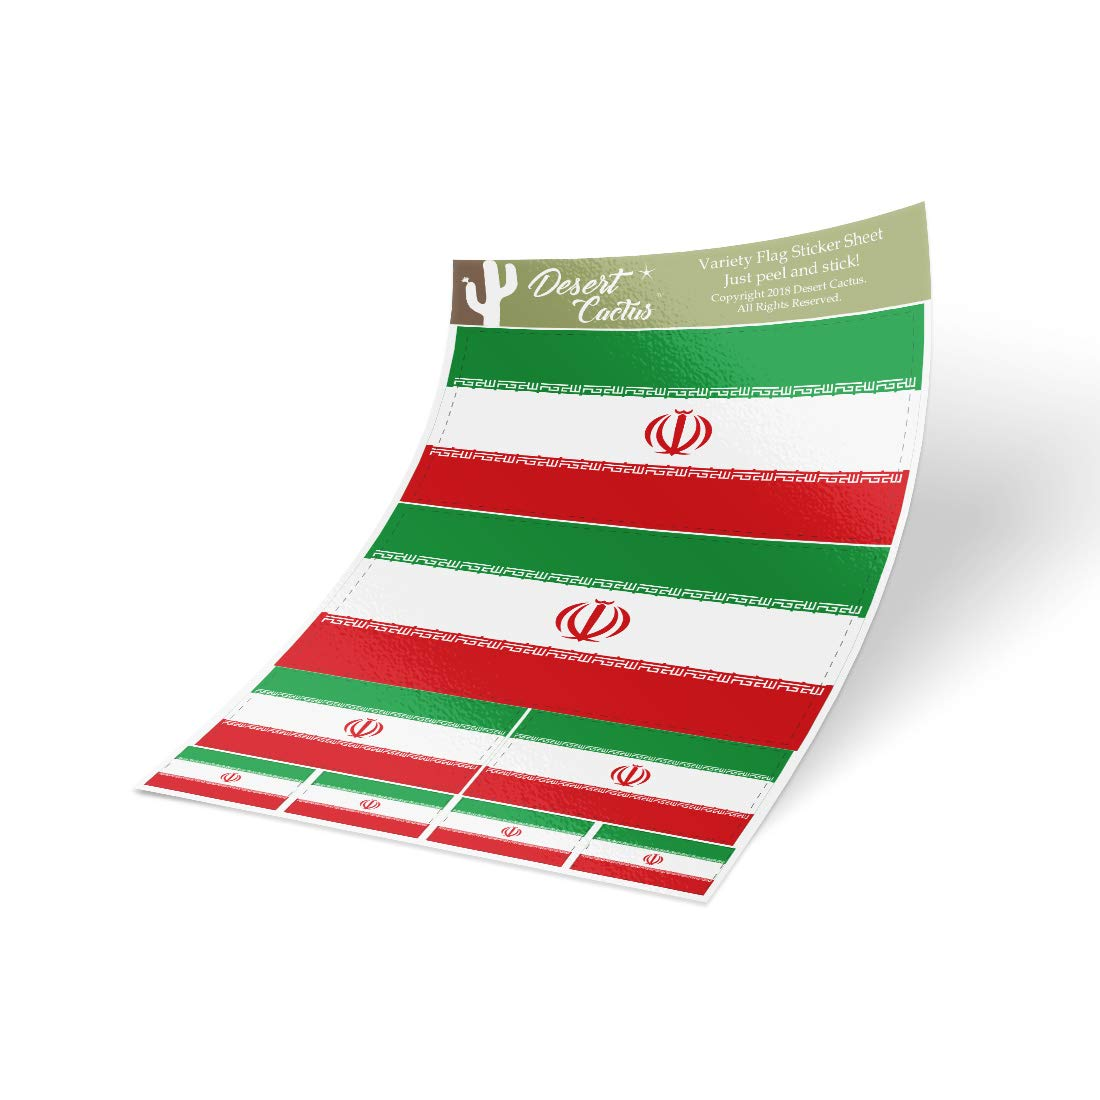 Desert Cactus Iran Country Flag Sticker Decal Variety Size Pack 8 Total Pieces Kids Logo Scrapbook Car Vinyl Window Bumper Laptop V